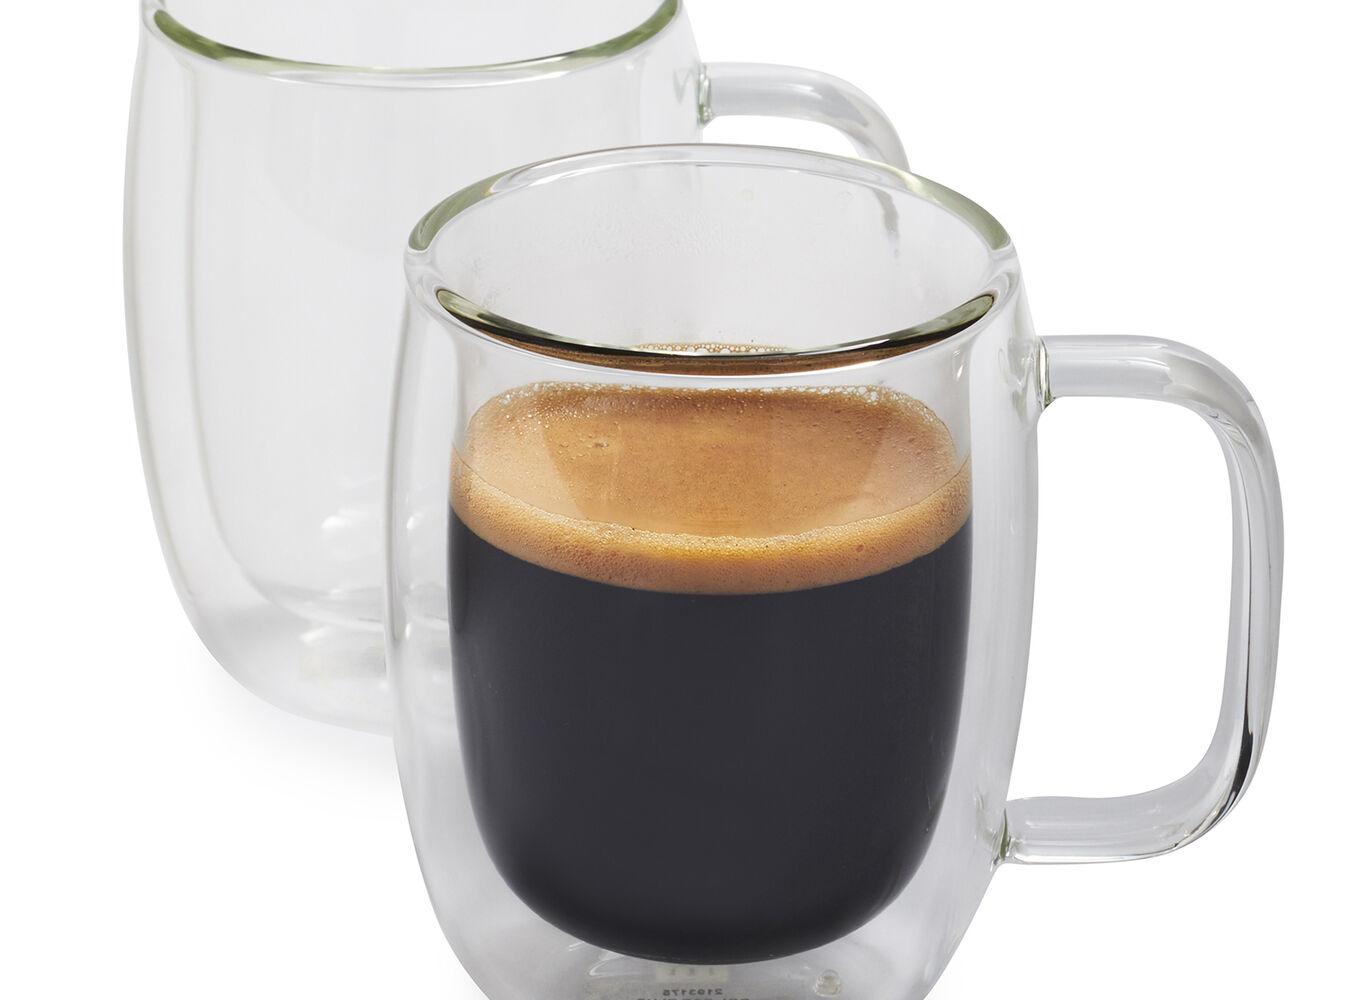 Zwilling J.A. Henckels Sorrento Plus Double-Wall Double Espresso Glasses, 4.5 oz., Set of 2   Sur La Table